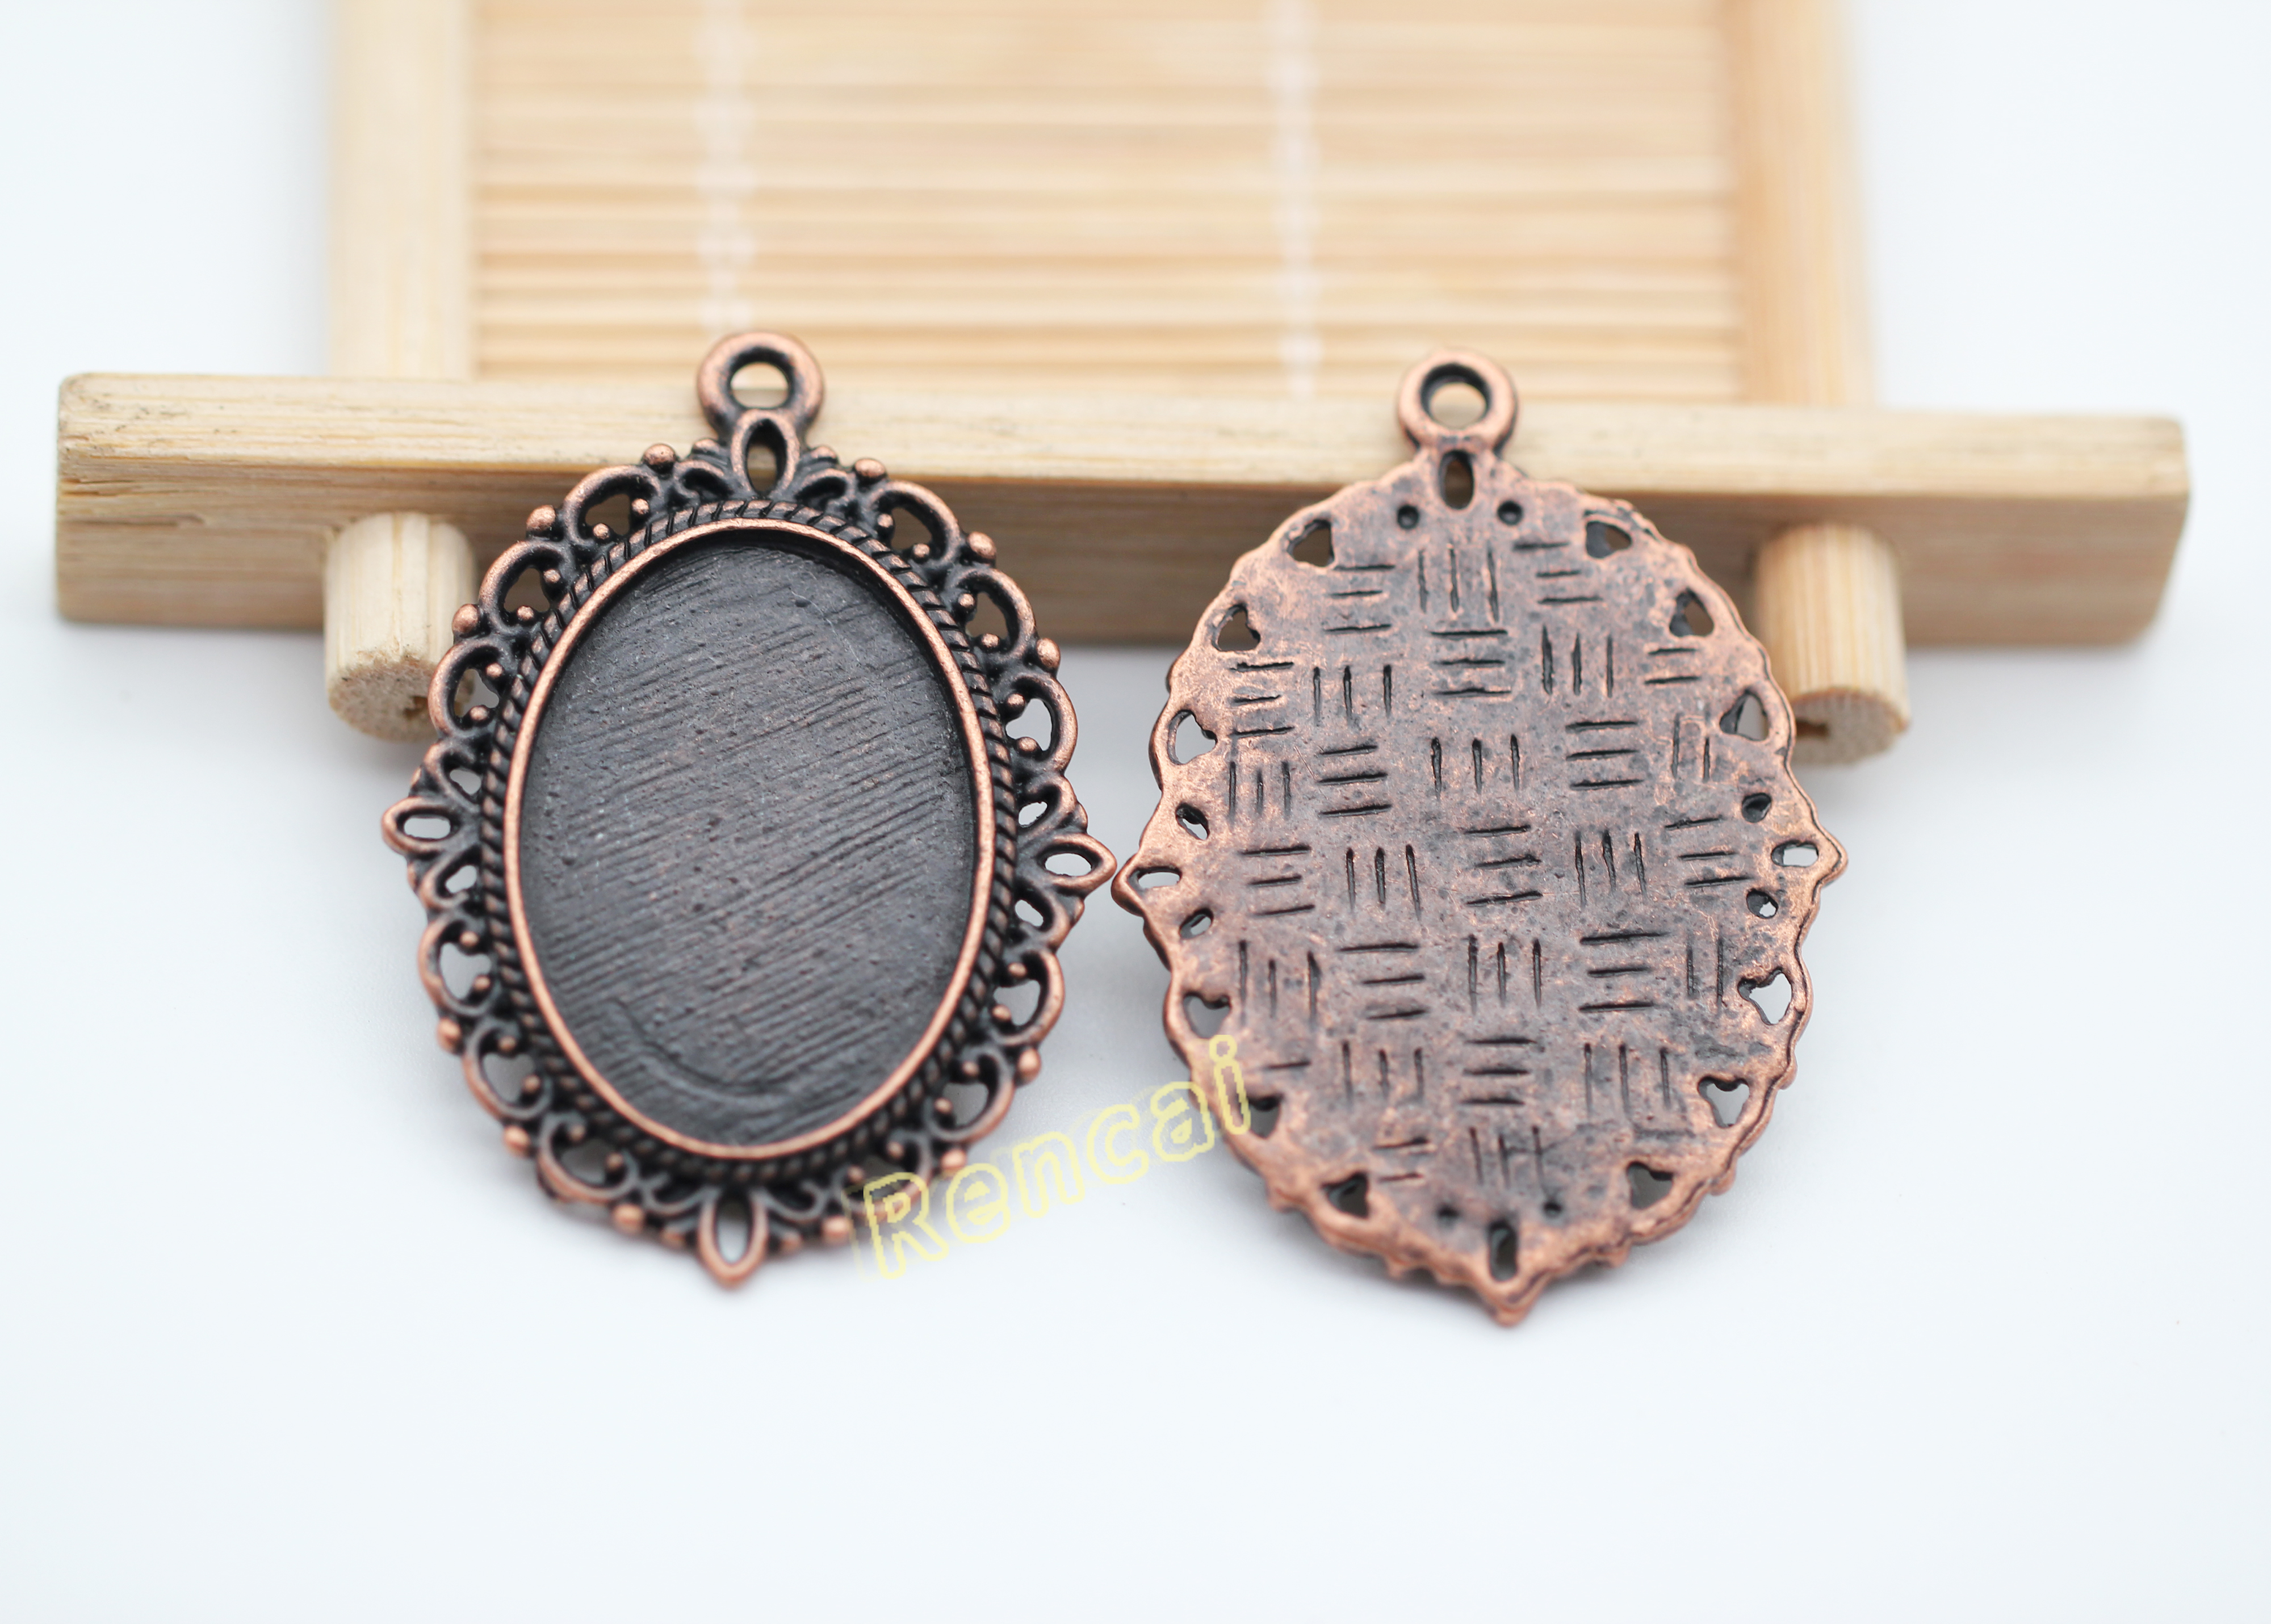 25mm DIY Jewelry Making Necklace Pendant Setting Cabochon Base Tray Bezel Blank